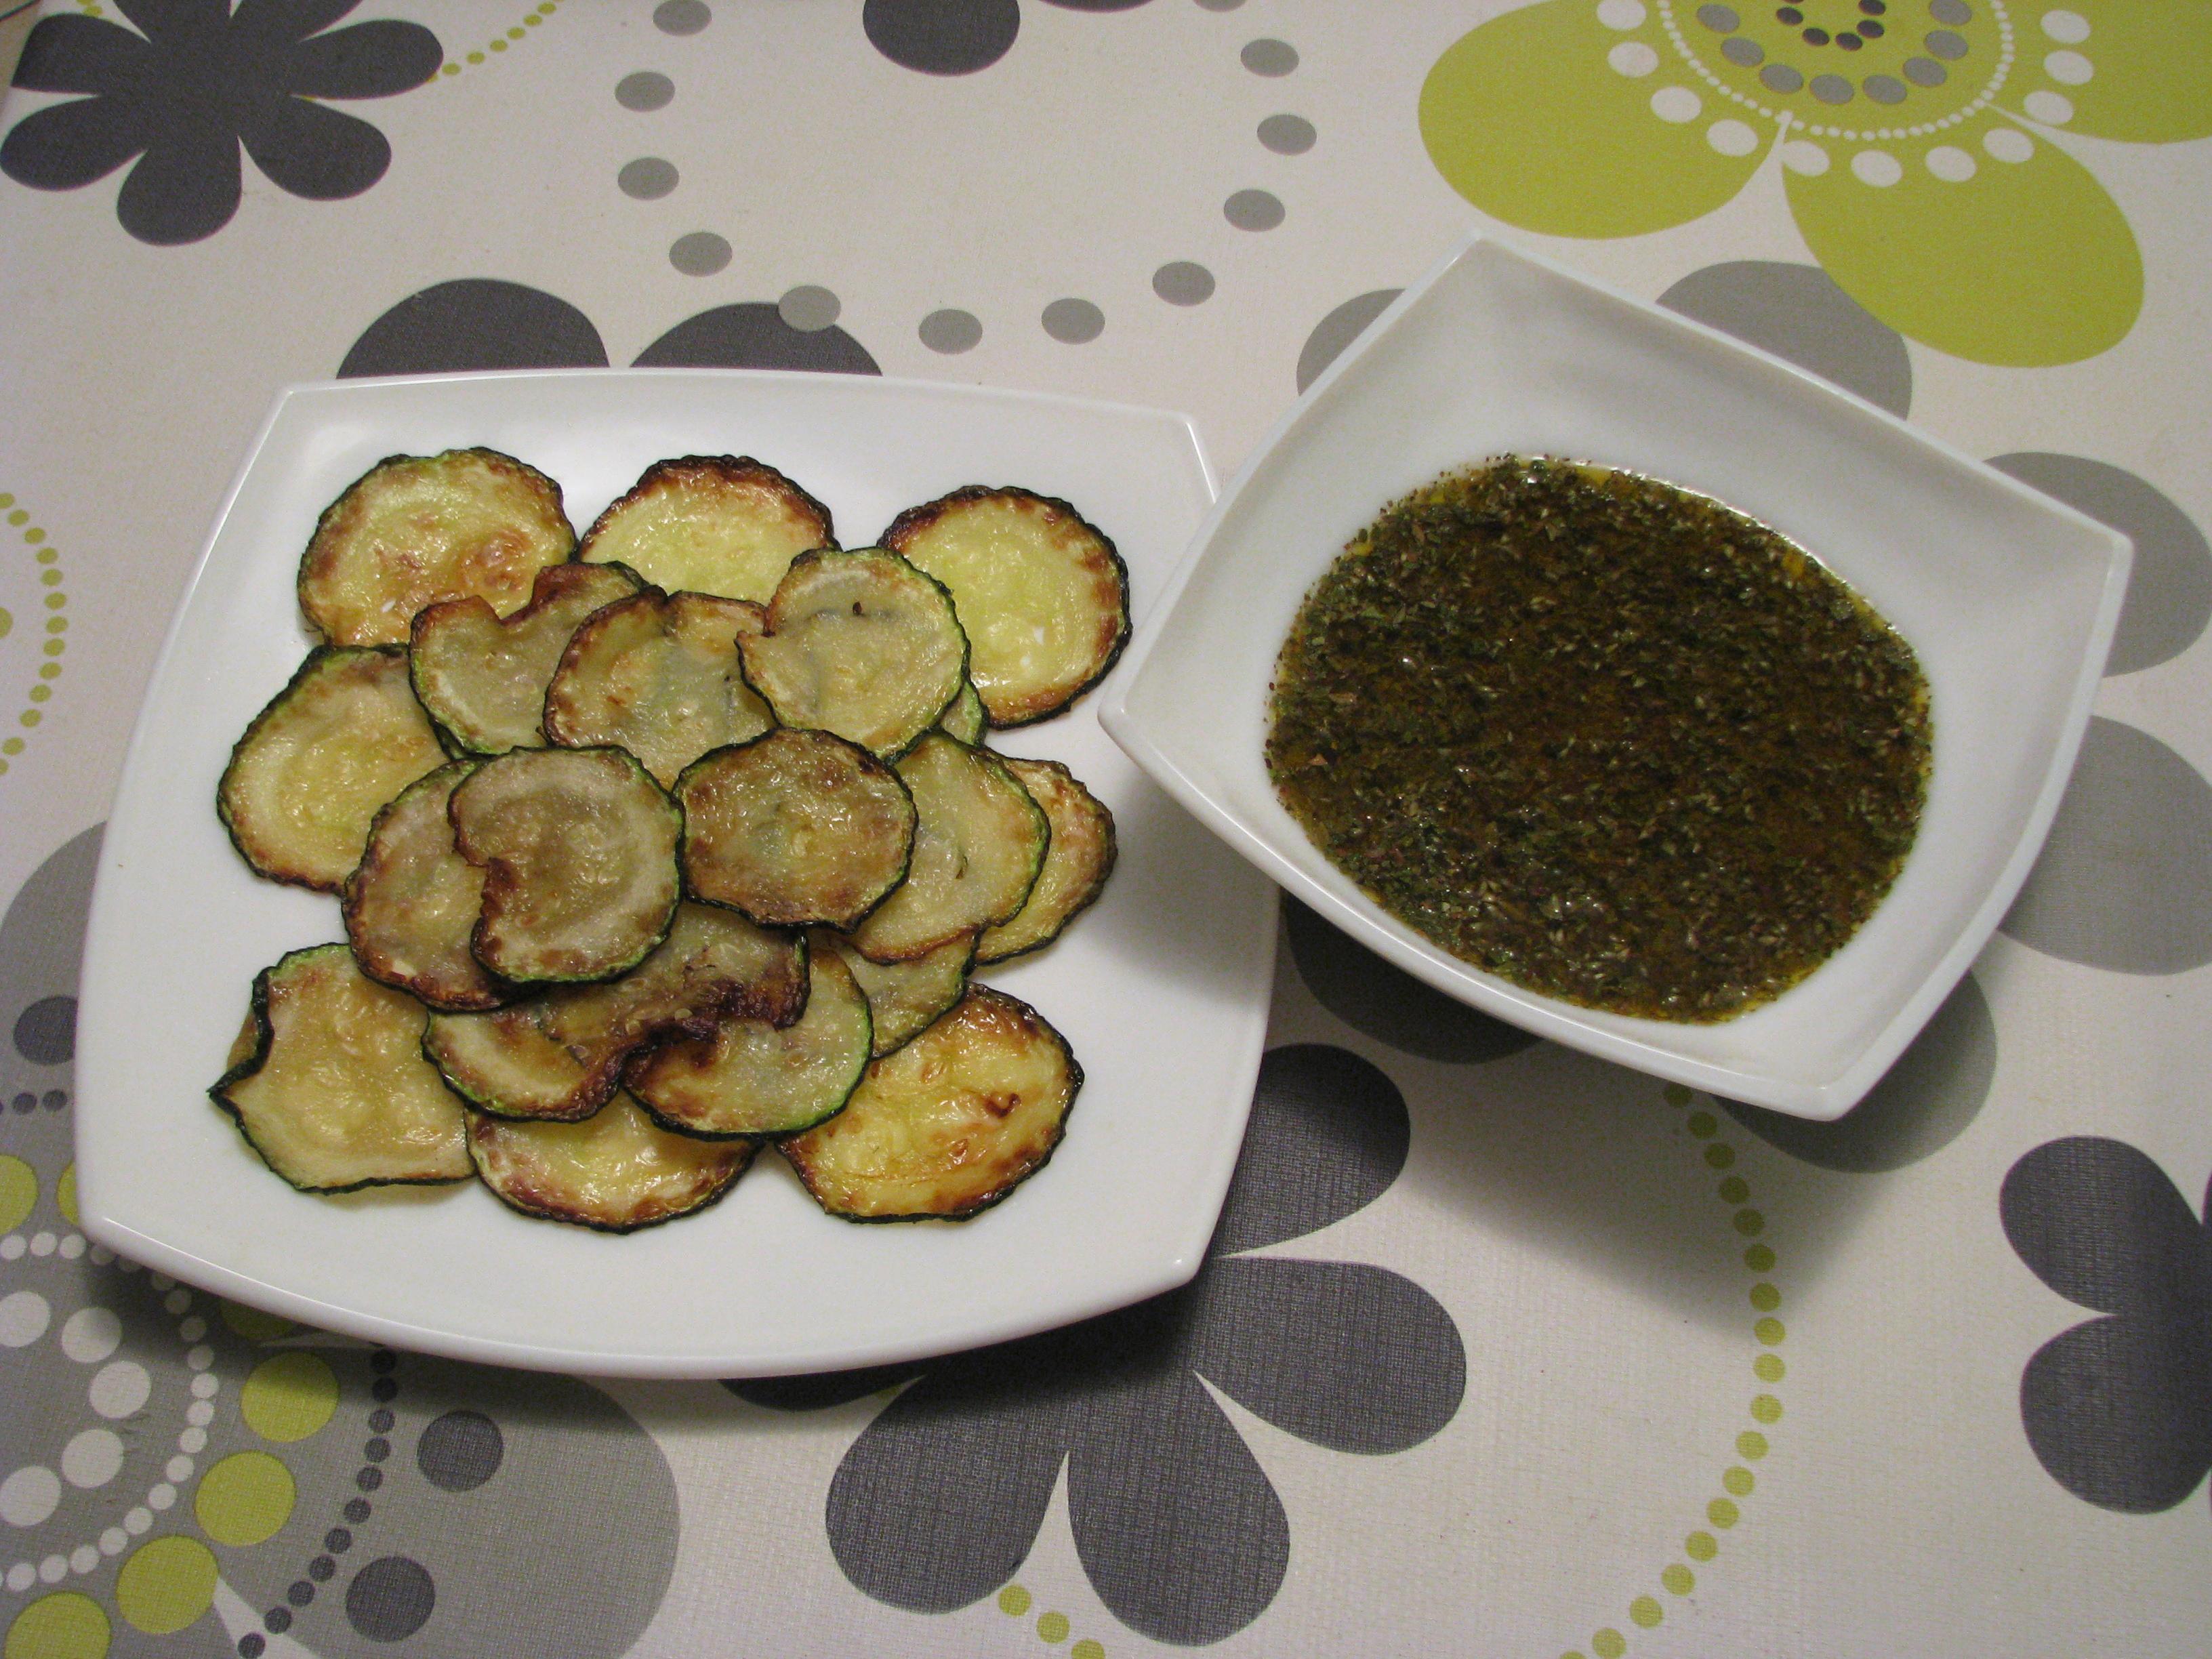 Calabacines a la plancha con salsa chimichurri casera